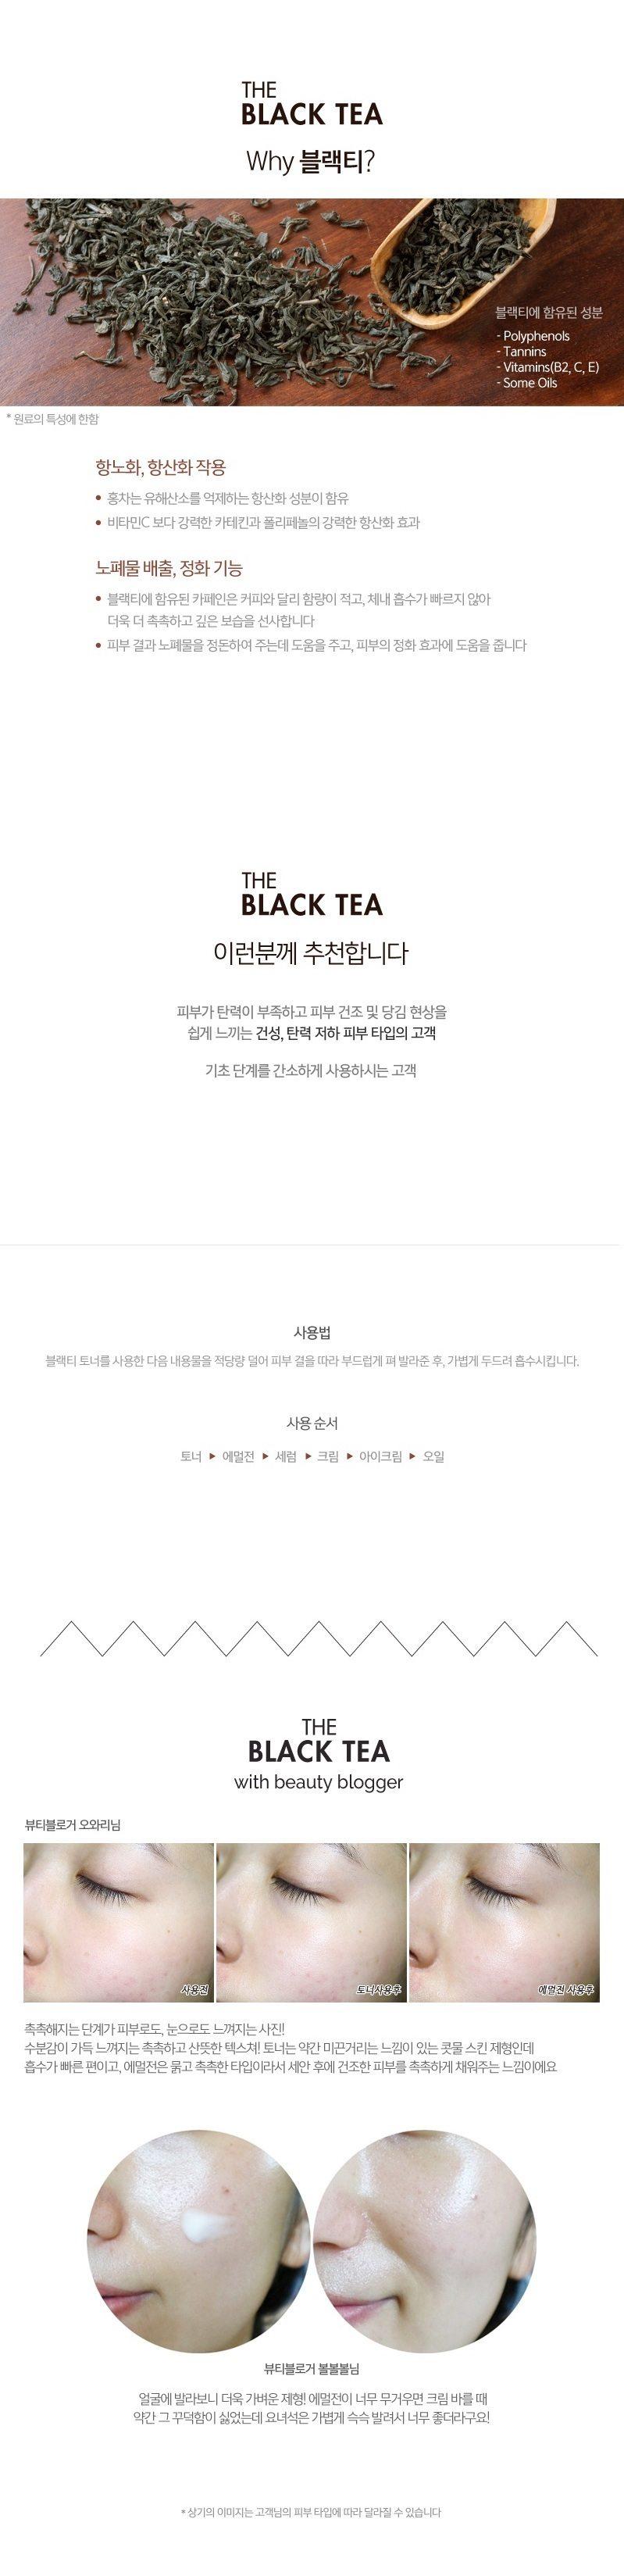 Tony Moly The Black Tea Skin Care 3 Set korean cosmetic skincare product online shop malaysia italy germany4